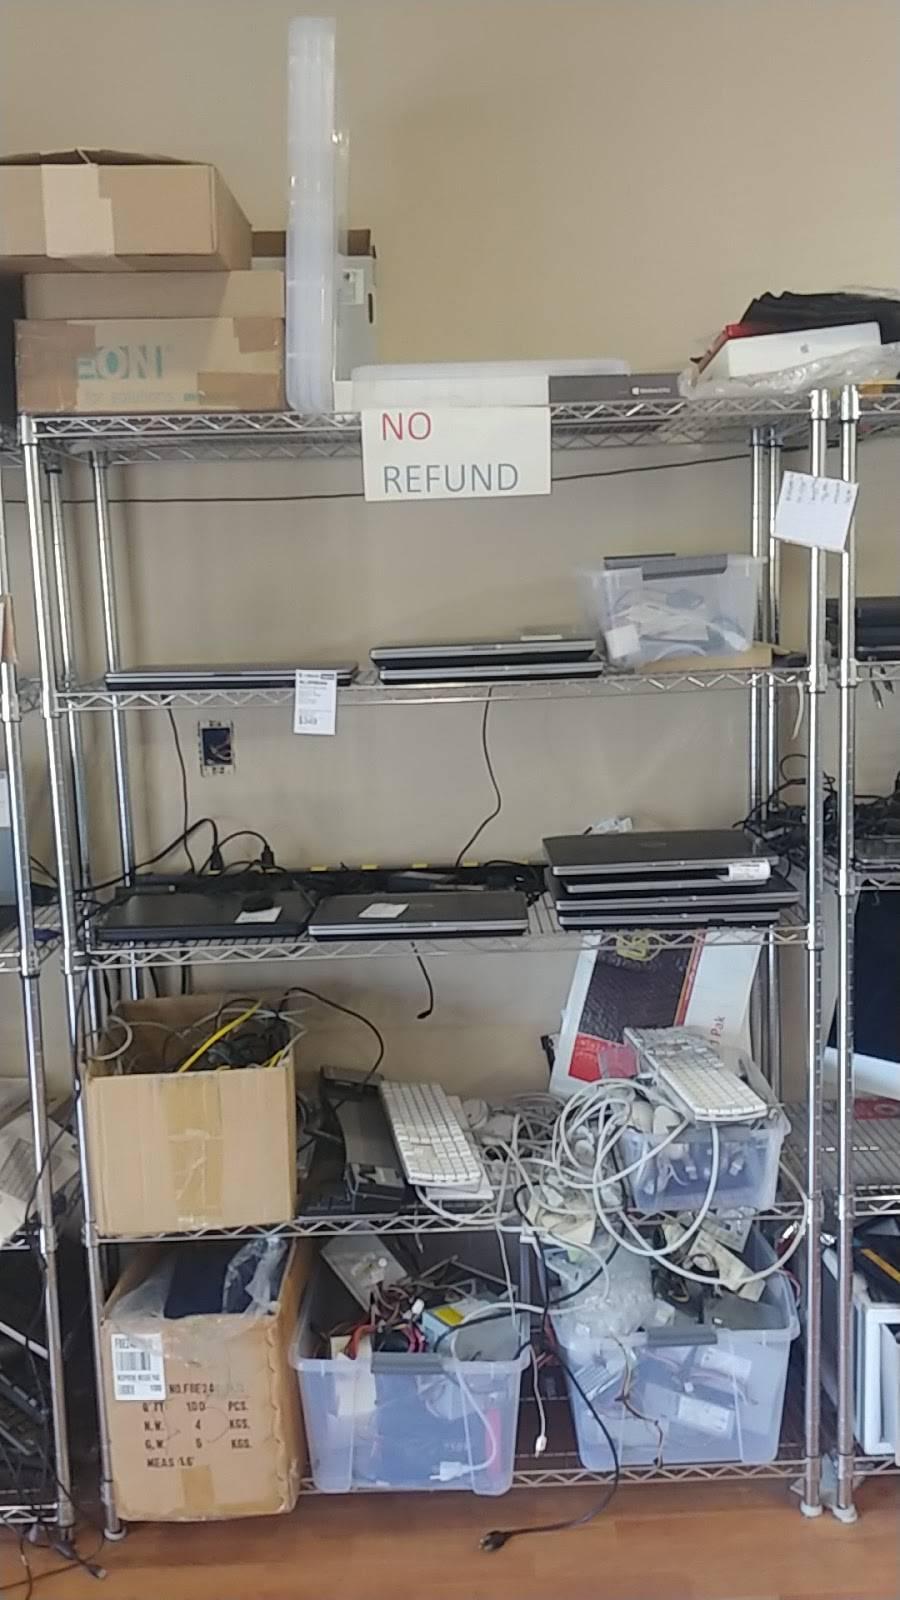 Comdory Computer - electronics store  | Photo 3 of 5 | Address: 9636 W Garden Grove Blvd #6, Garden Grove, CA 92844, USA | Phone: (714) 944-4401